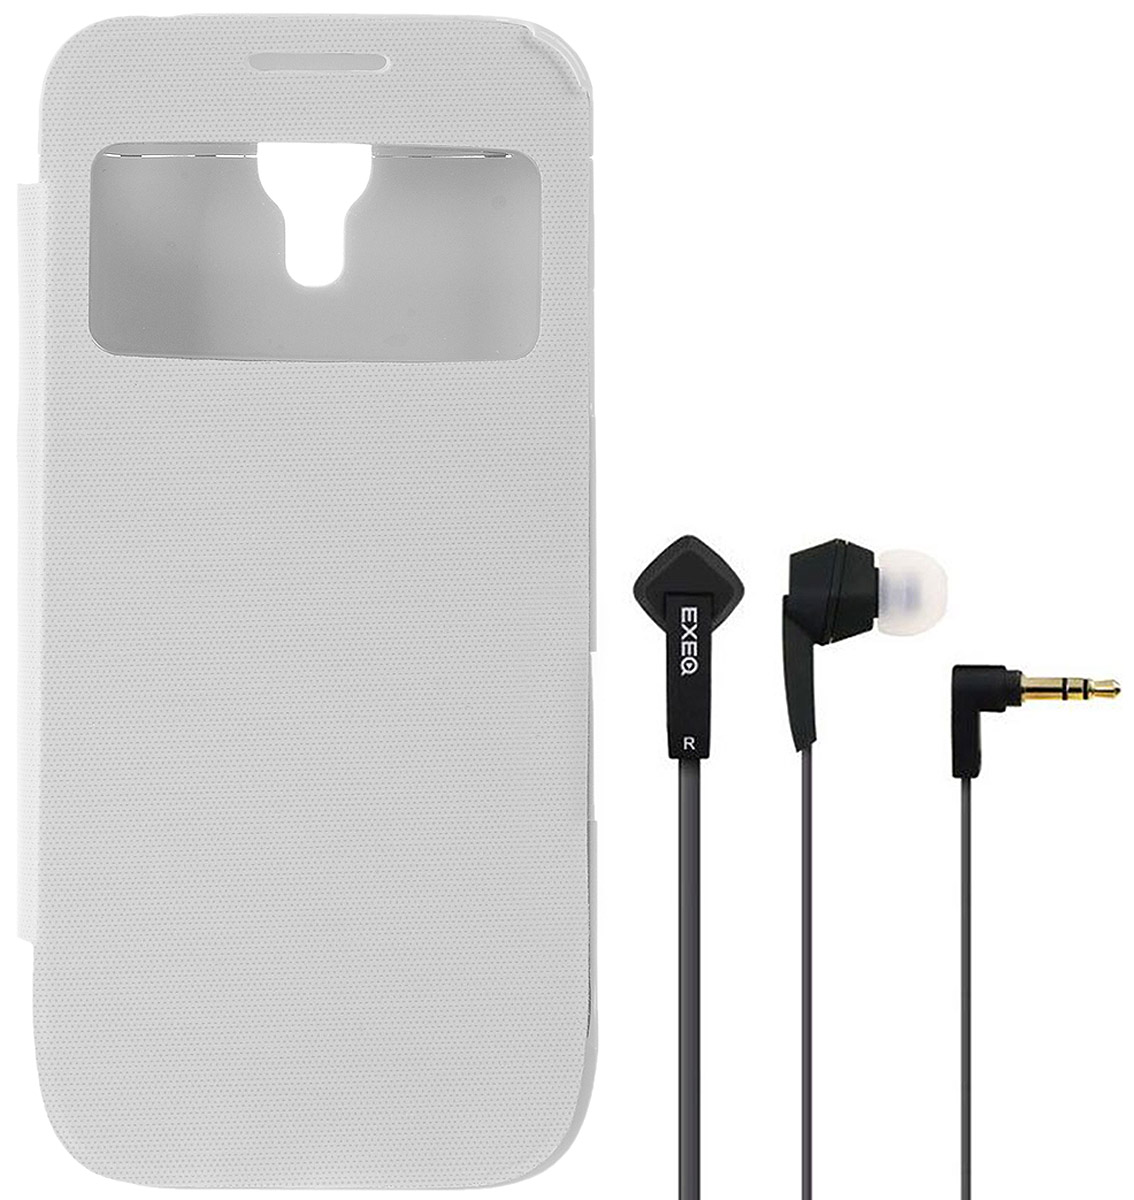 где купить  EXEQ HelpinG-SF04 чехол-аккумулятор для Samsung Galaxy S4 mini, White (2200 мАч, флип-кейс)  дешево